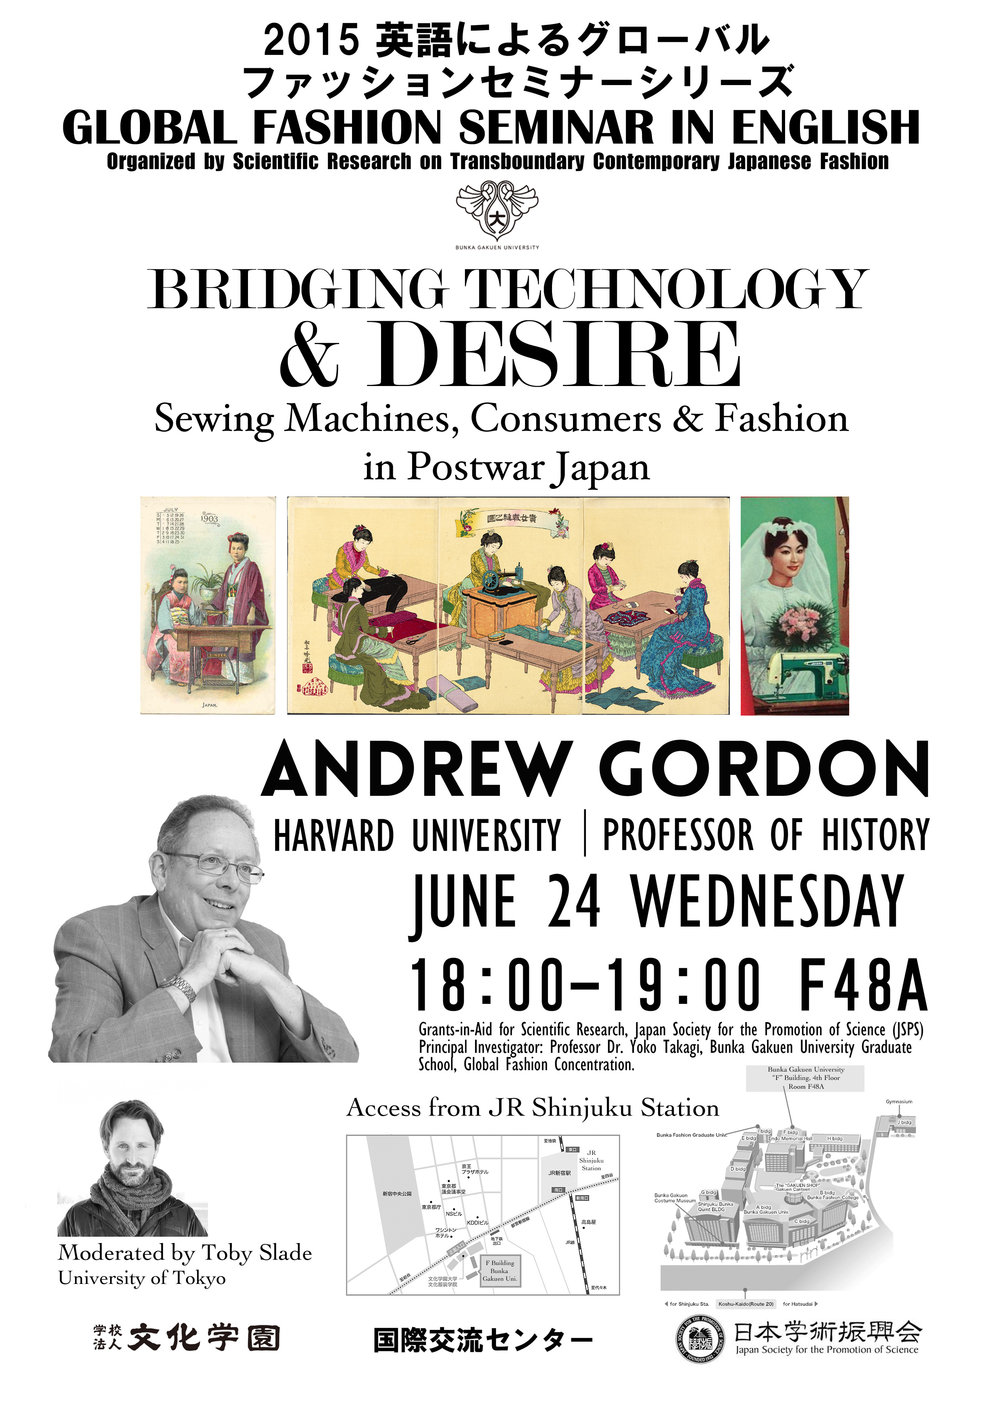 Hosting Andrew Gordon at Bunka - Bridging Technology & Desire: Sewing Machines, Consumers & Fashion in Postwar Japan24 June 2015